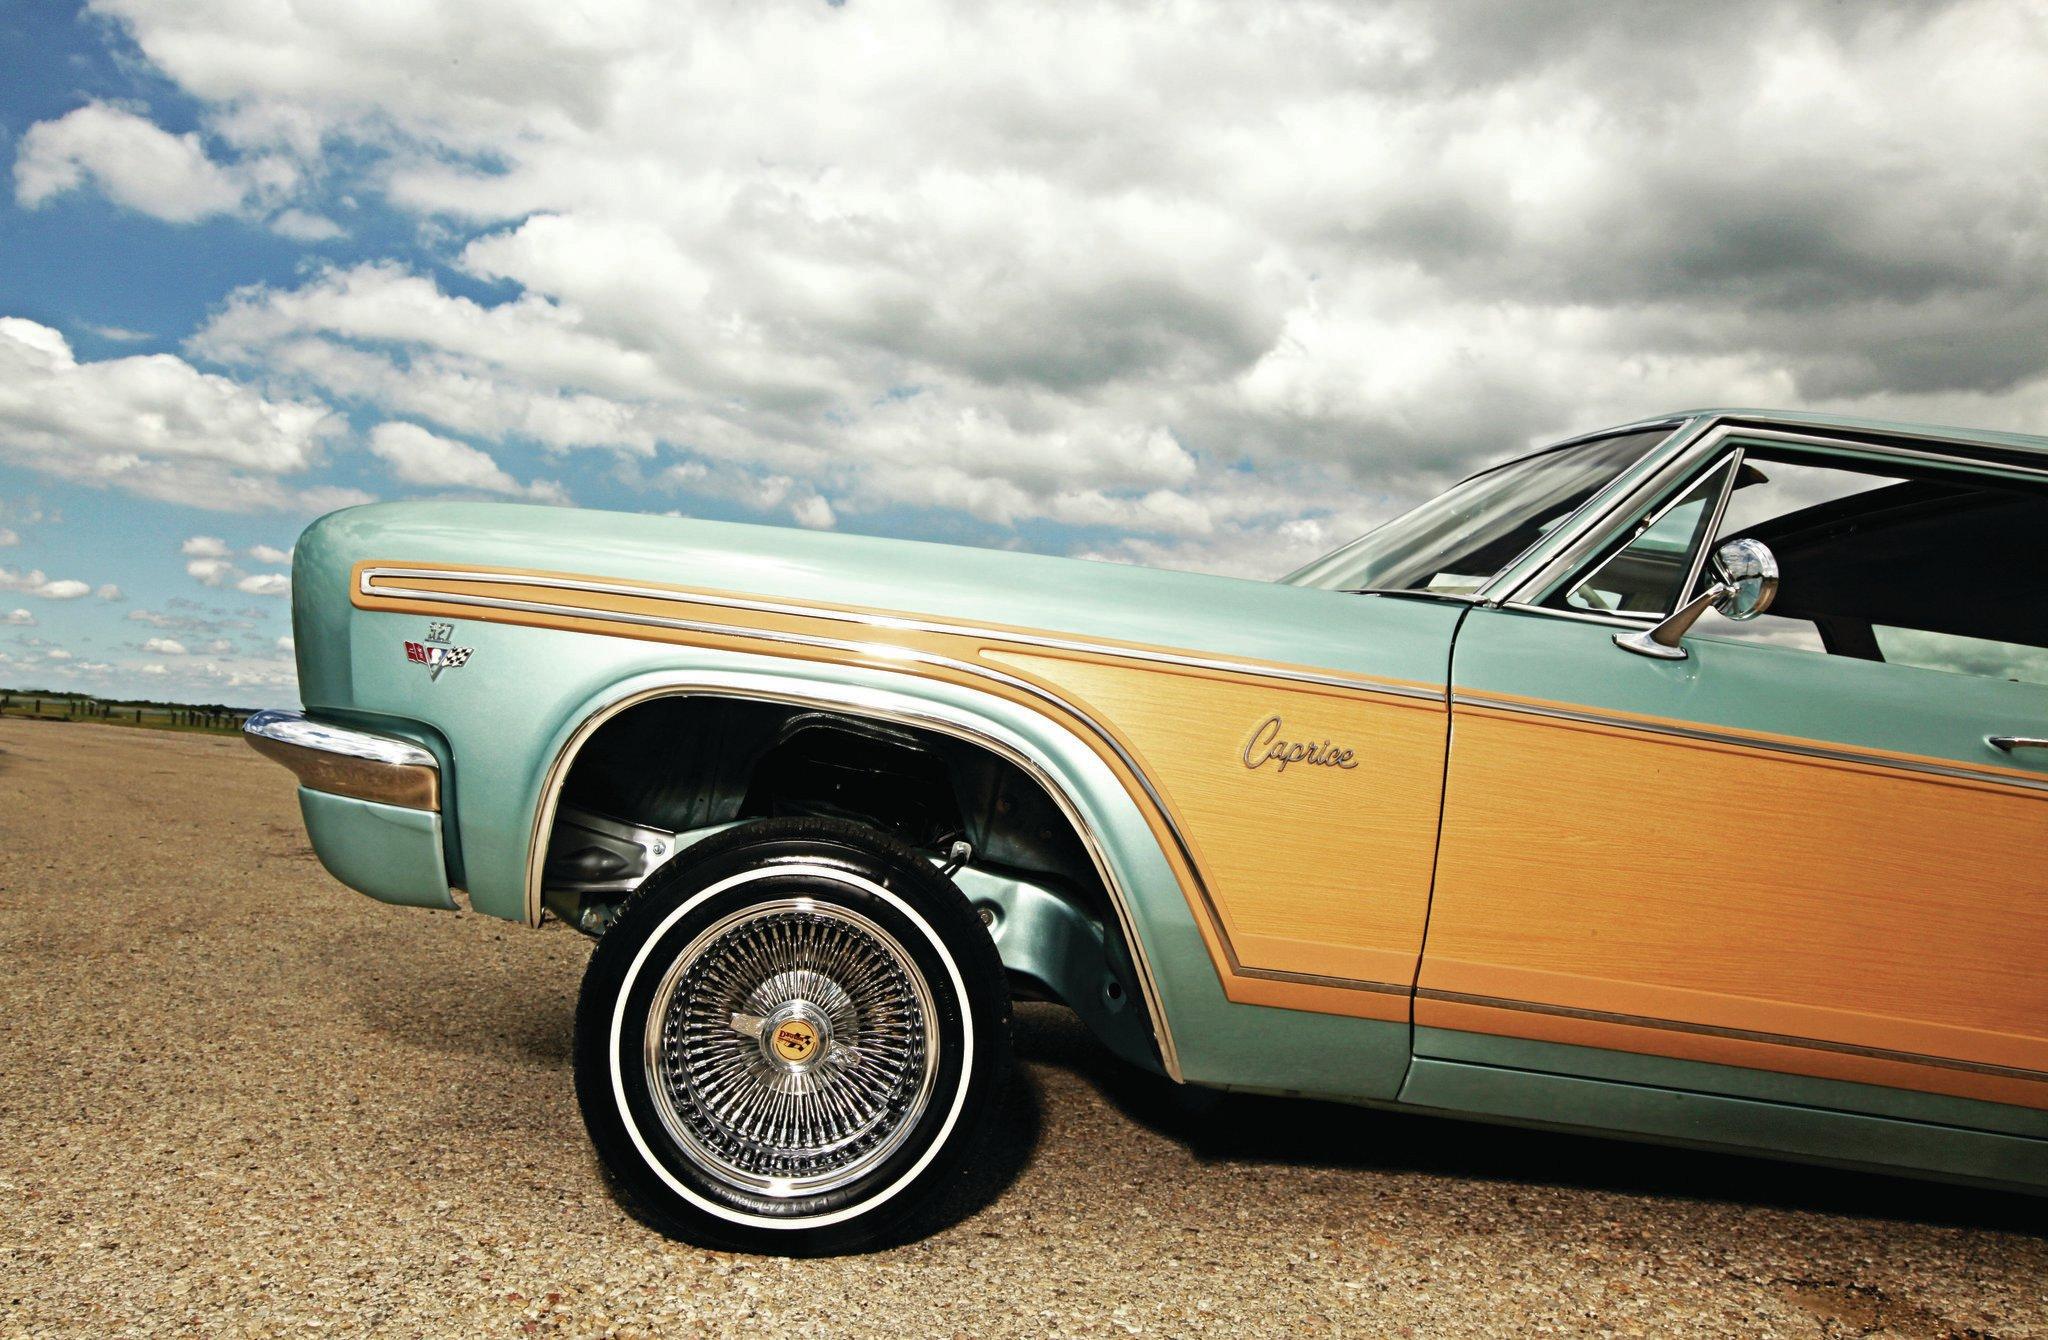 1966 CHEVROLET CAPRICE STATION WAGON CUSTOM, RUST-FREE ...   1966 Chevrolet Caprice Wagon